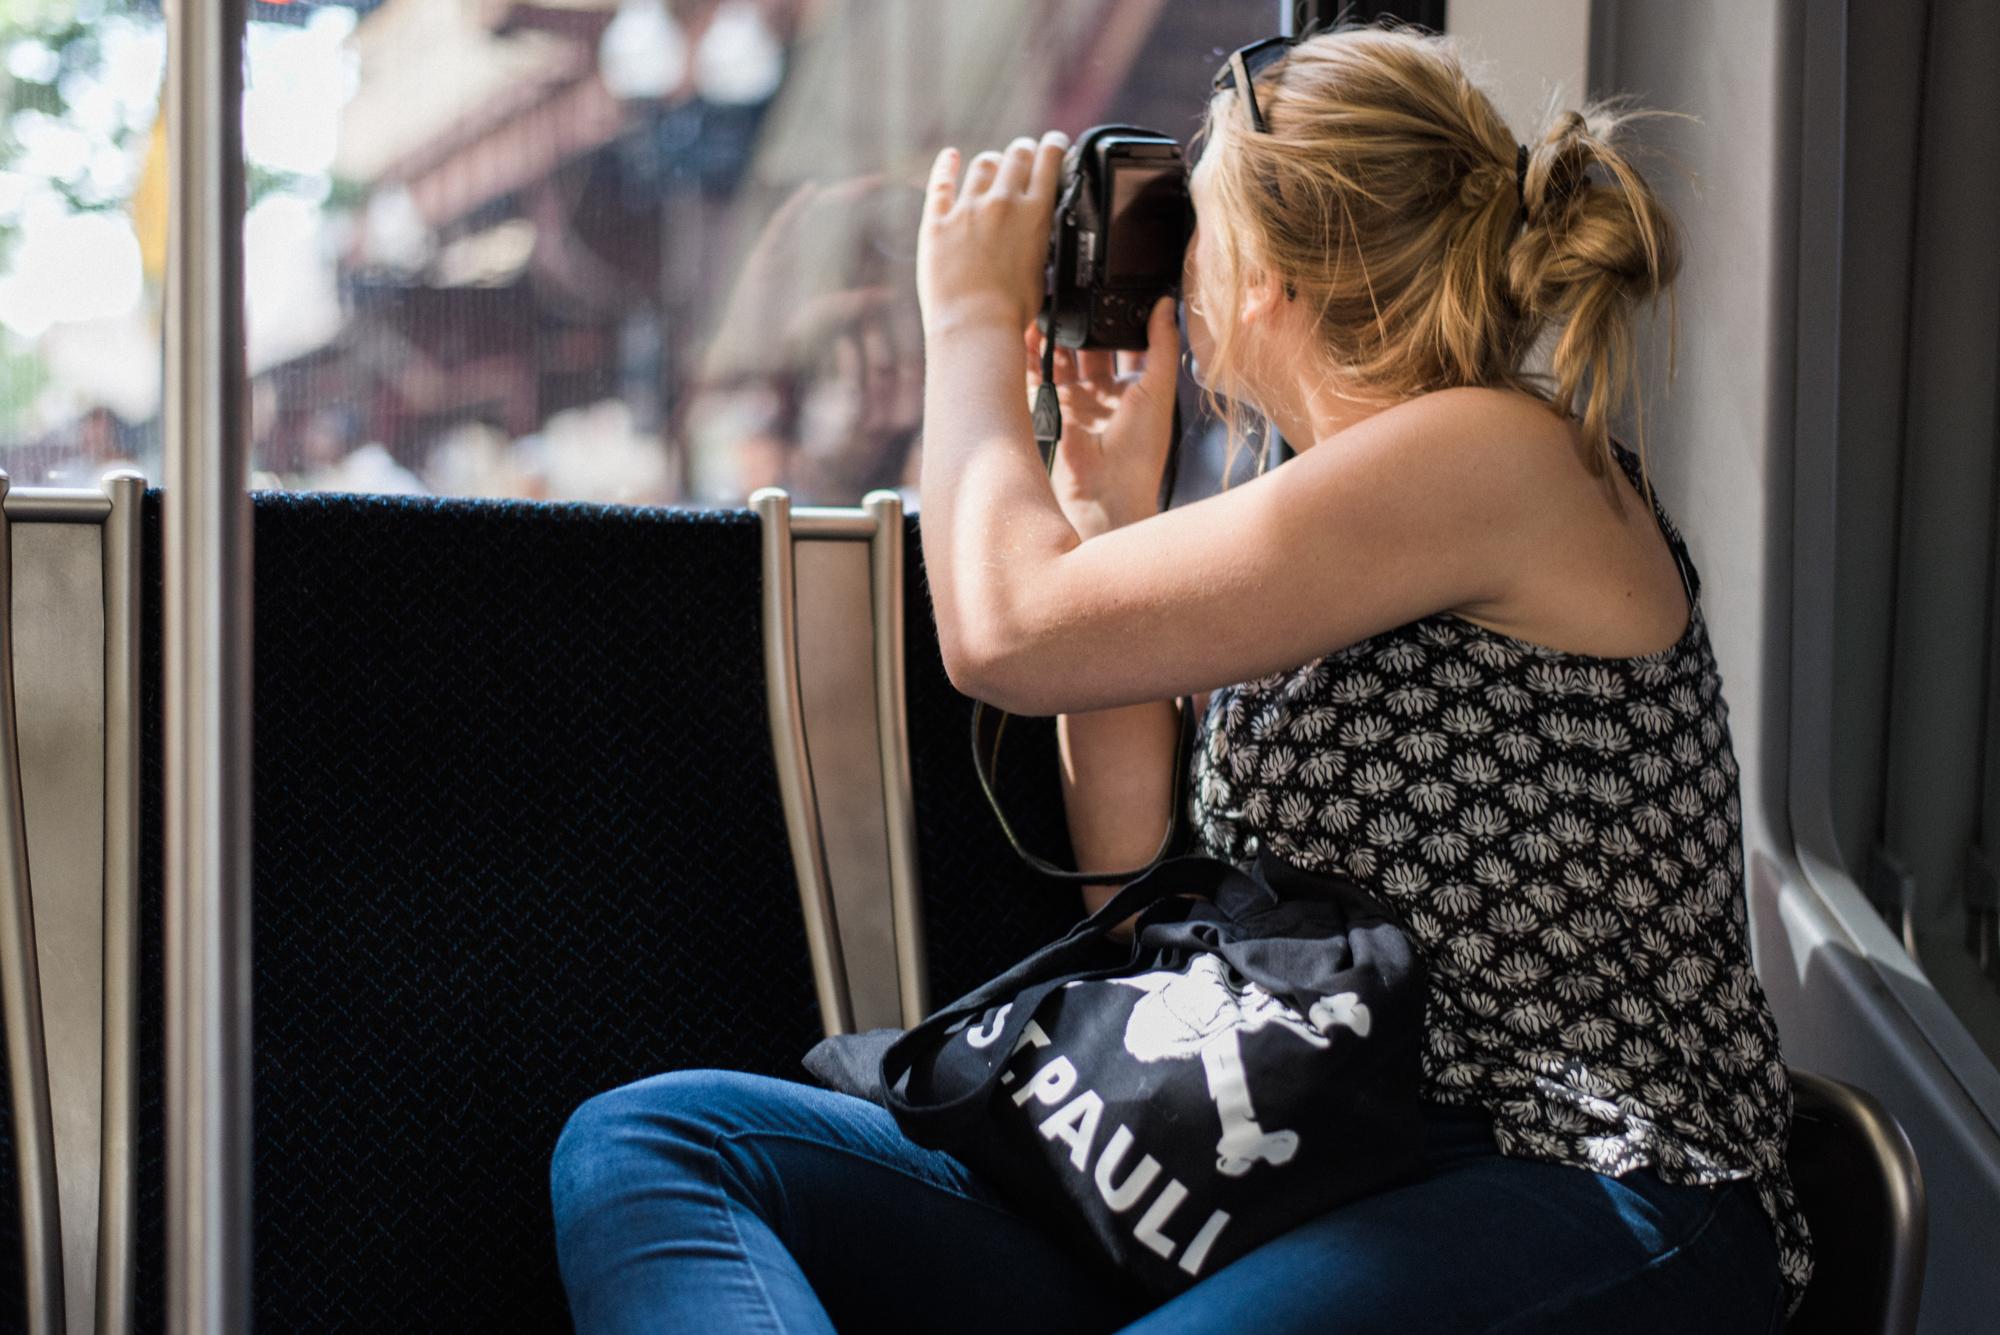 Chelsea Bliefernicht | Chicago Photographer